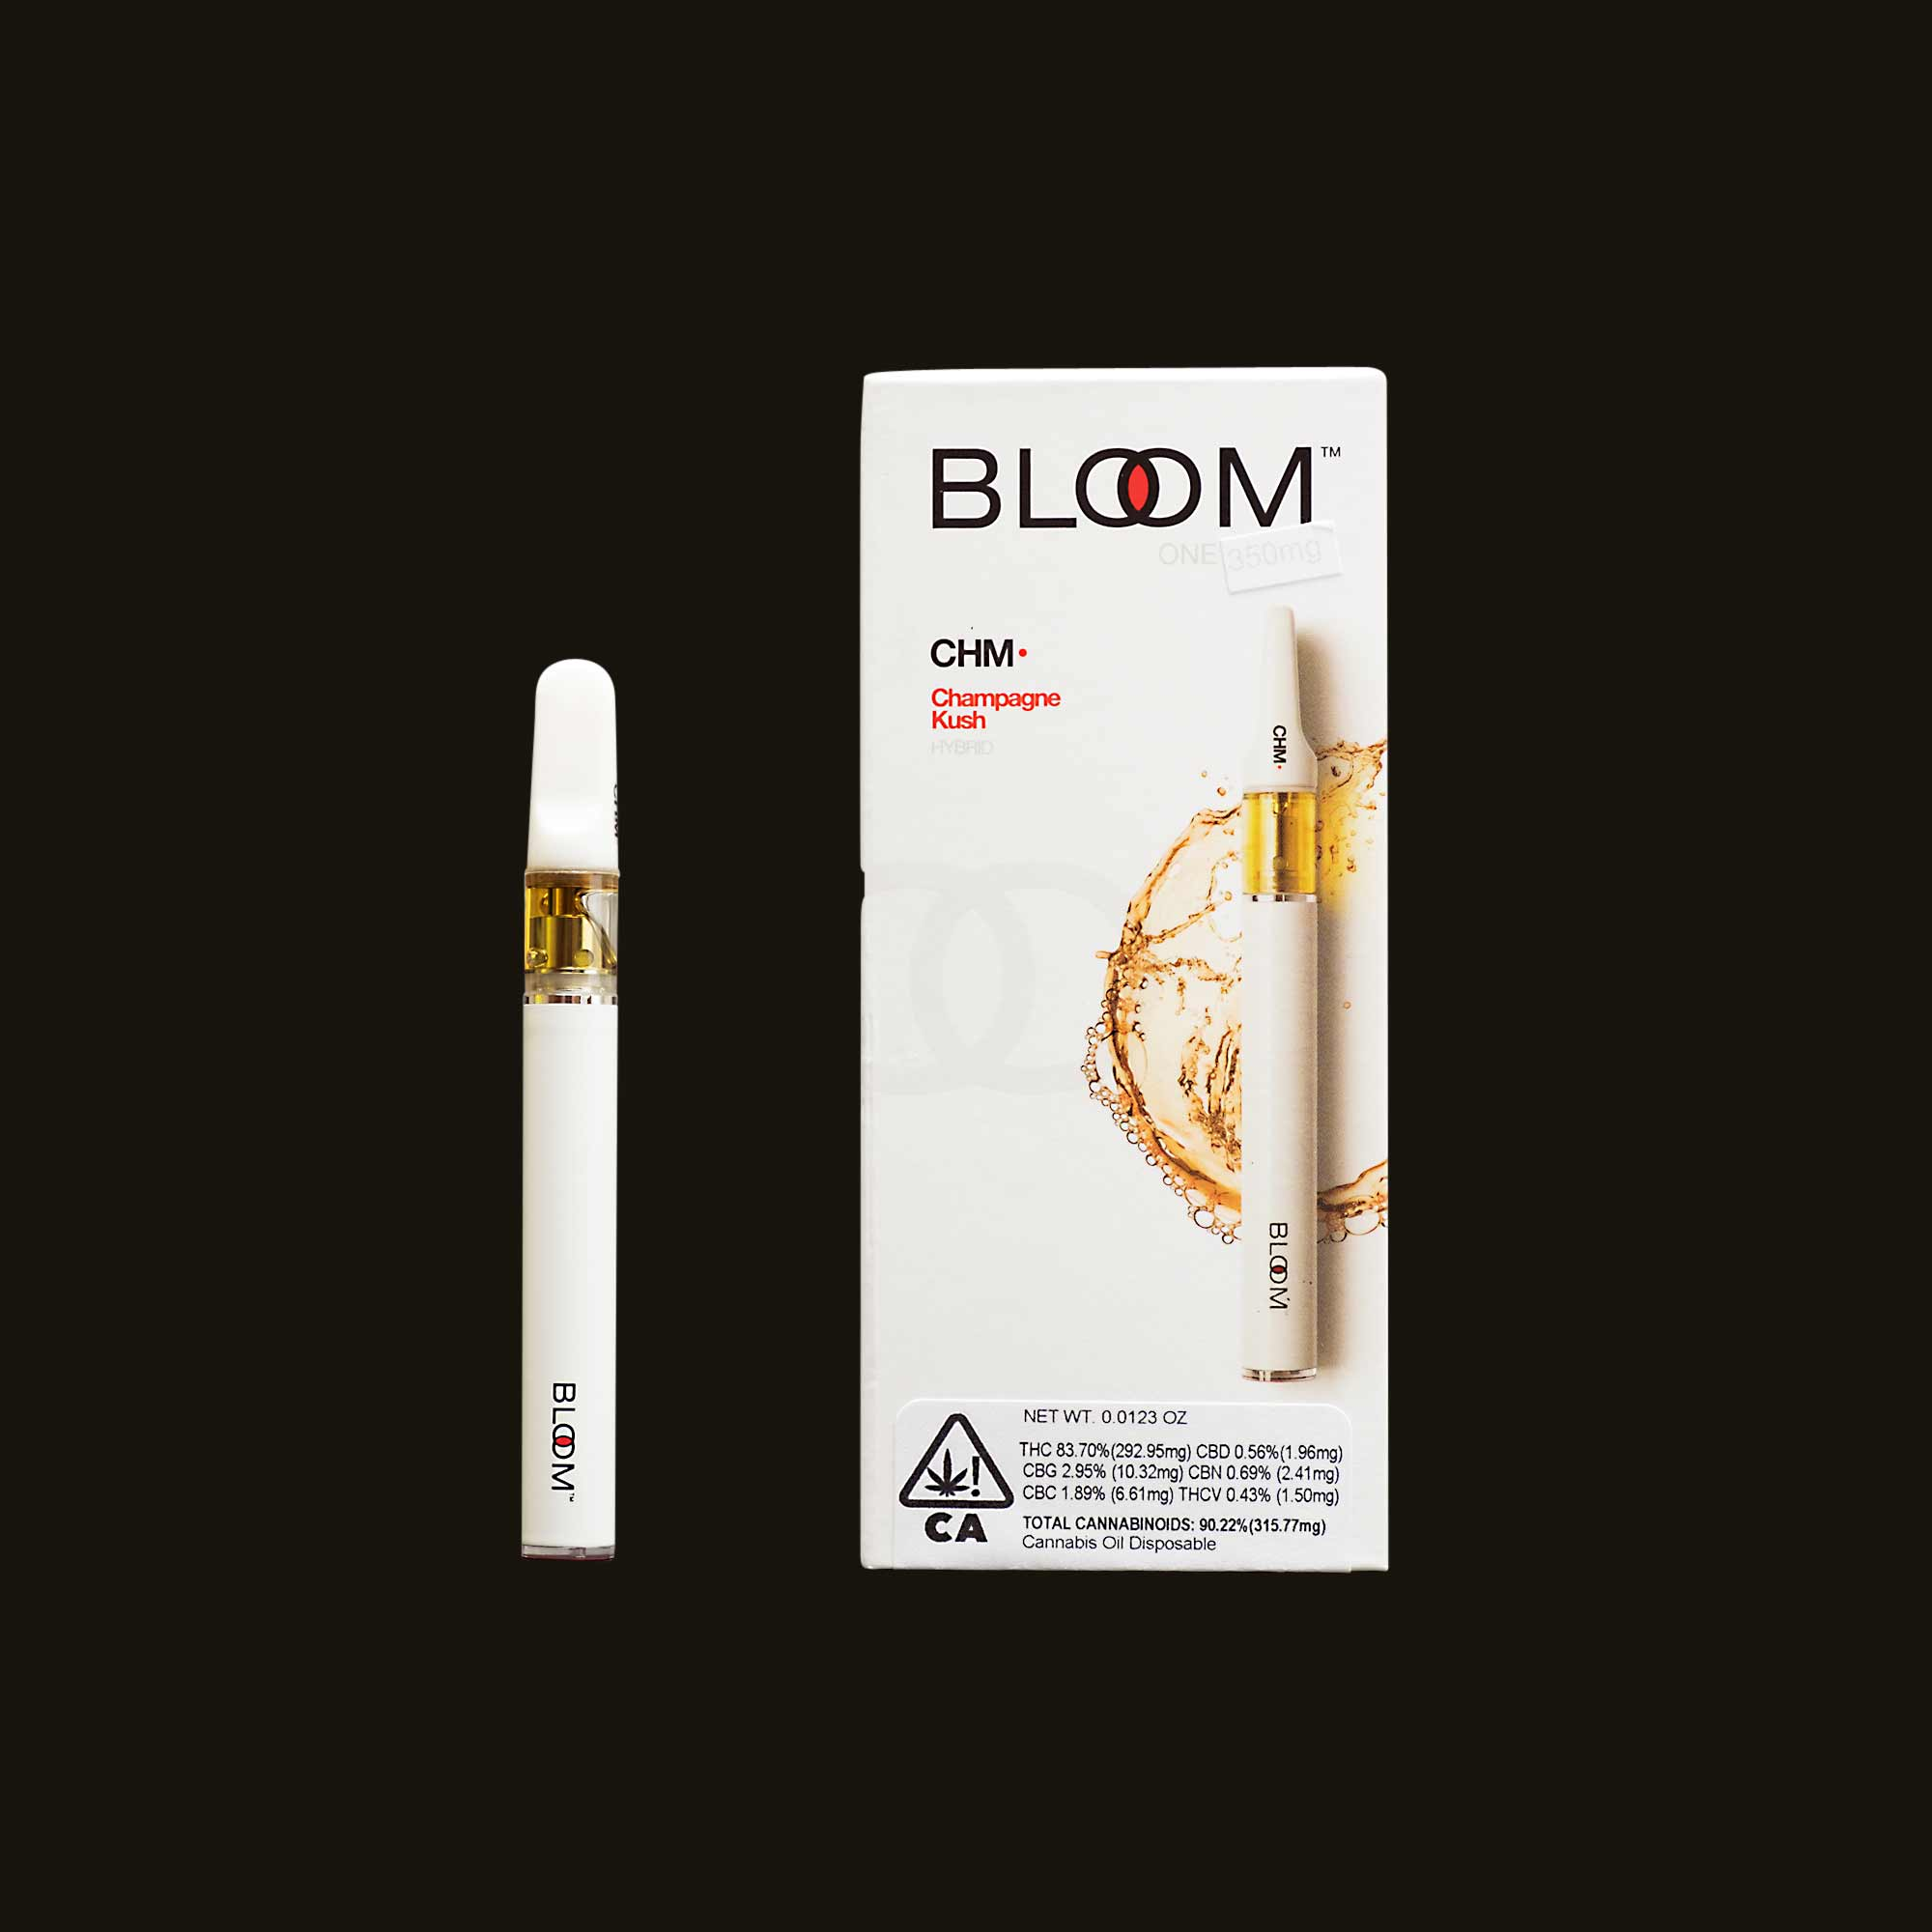 Bloom Brands Champagne Kush Bloom One